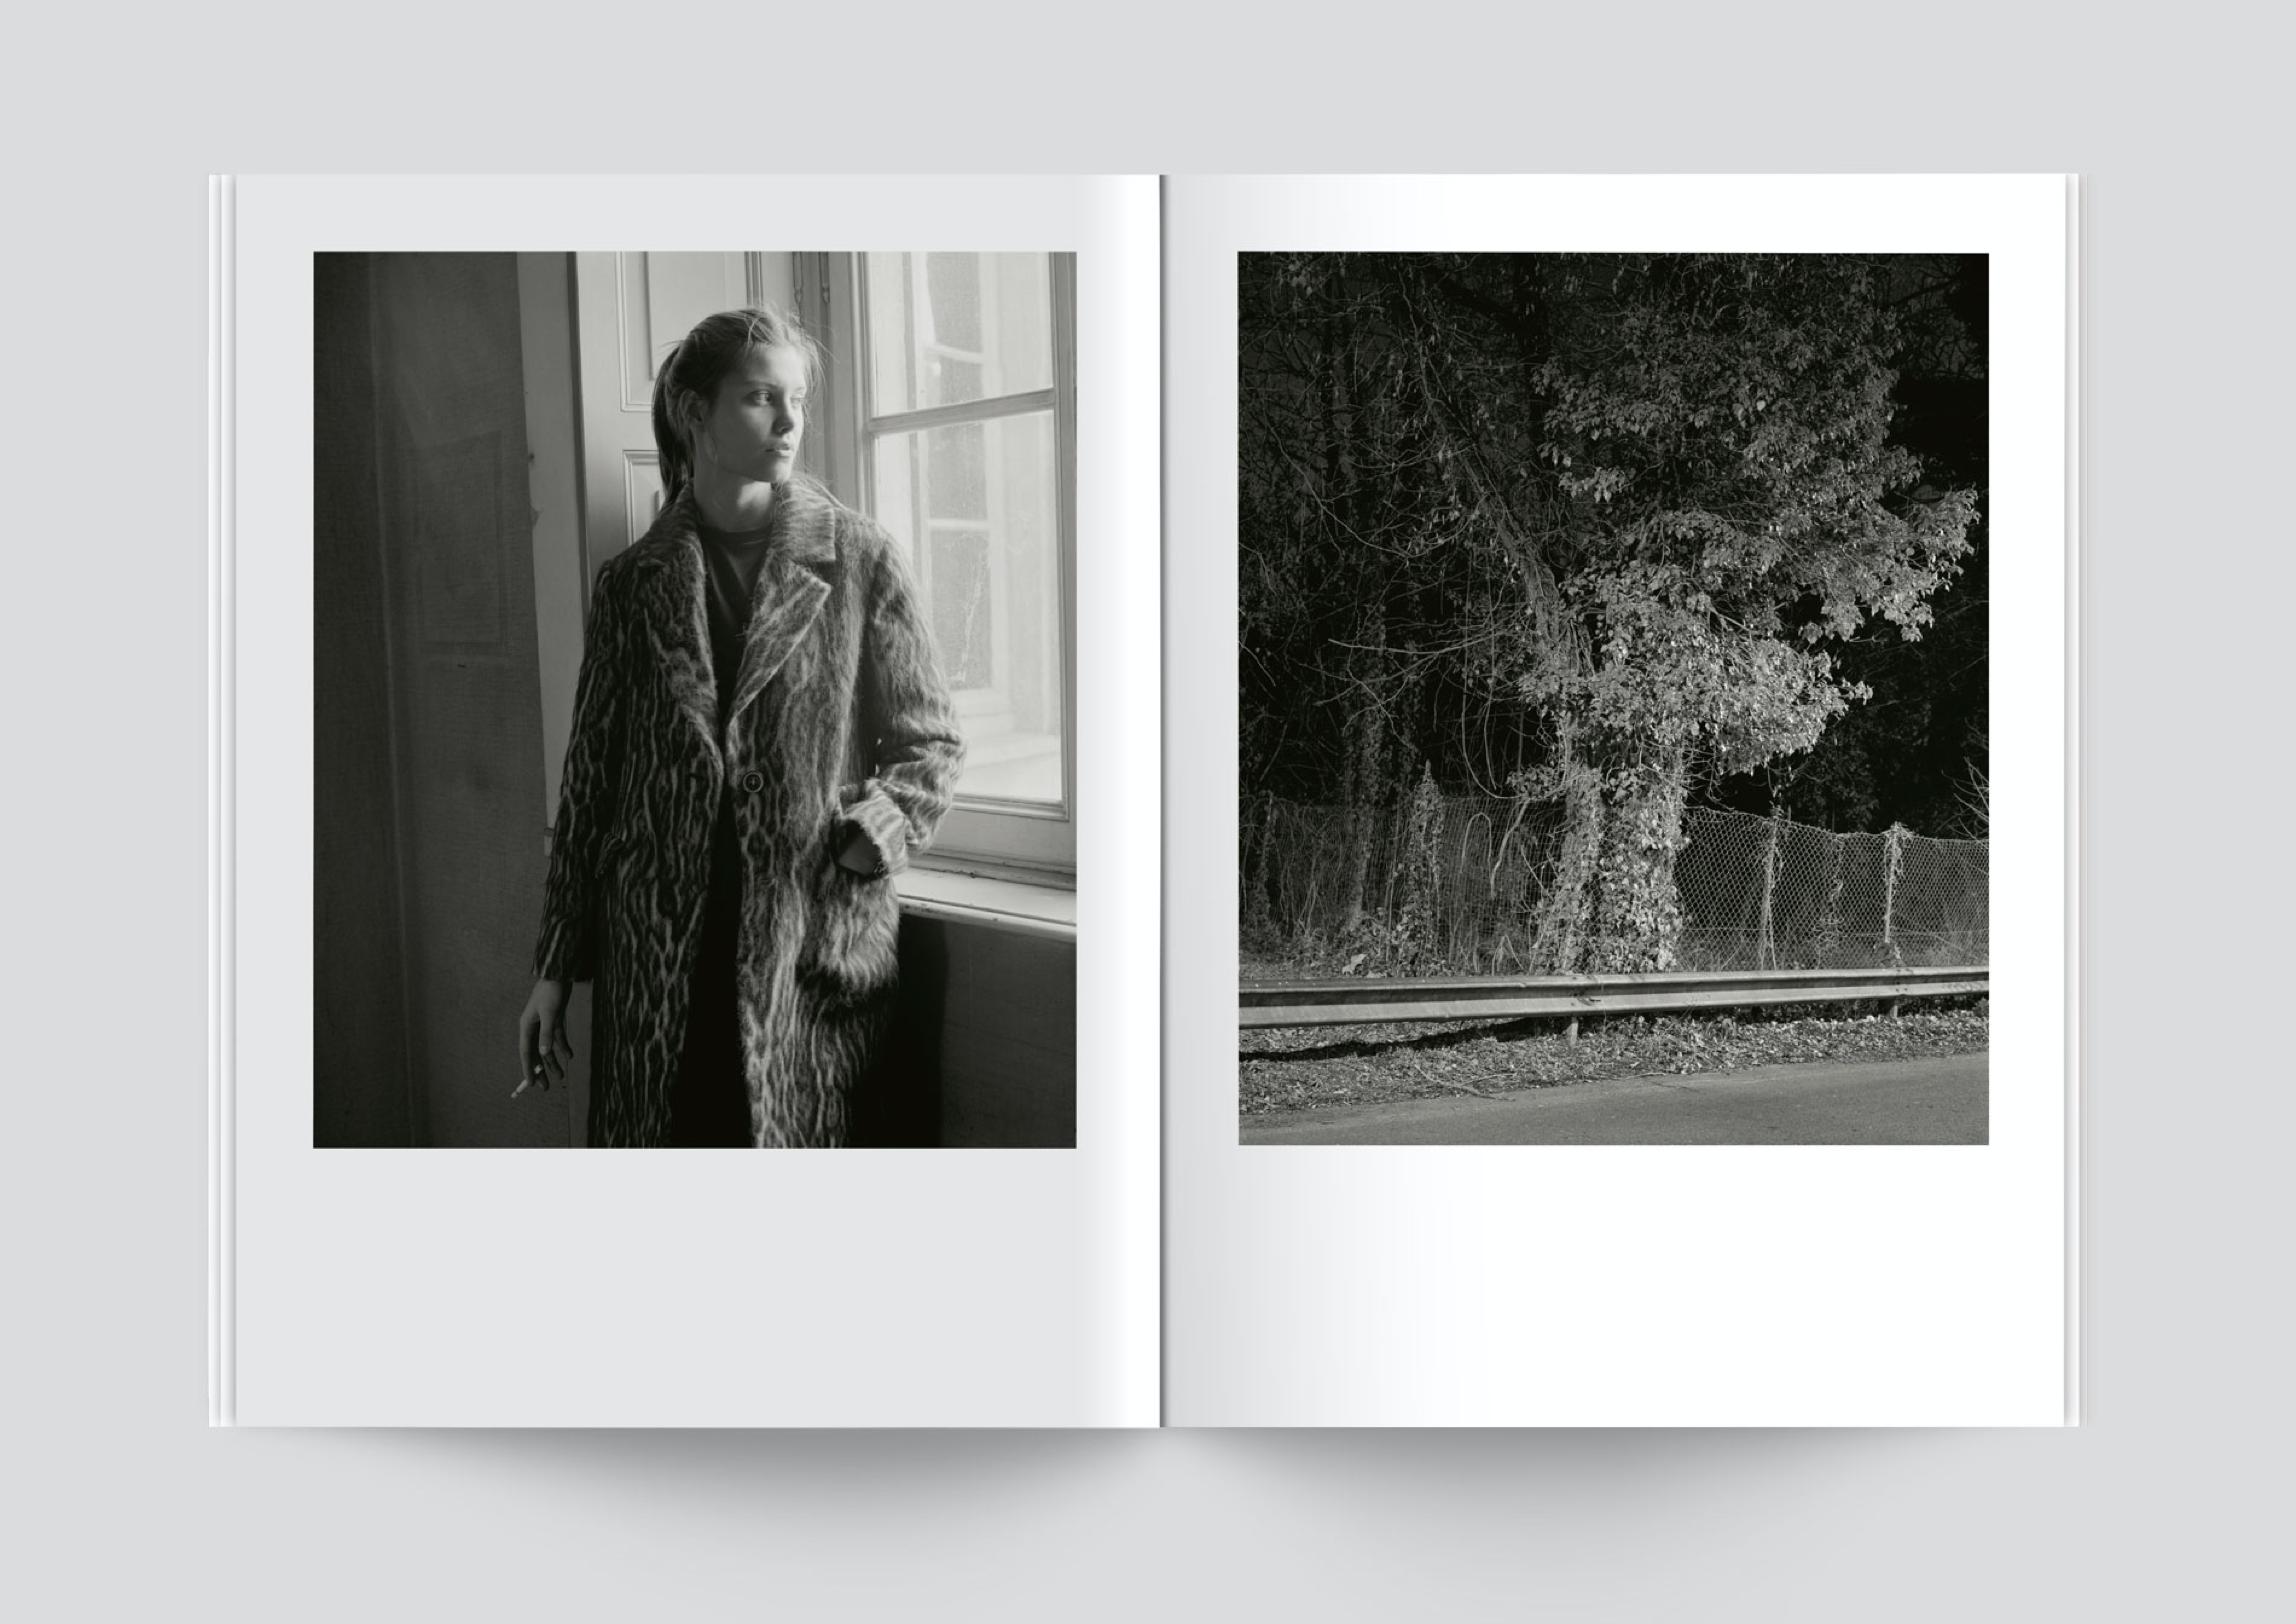 Santoni-Edited-by-Marco-Zanini-Ingar-Krauss-06.png